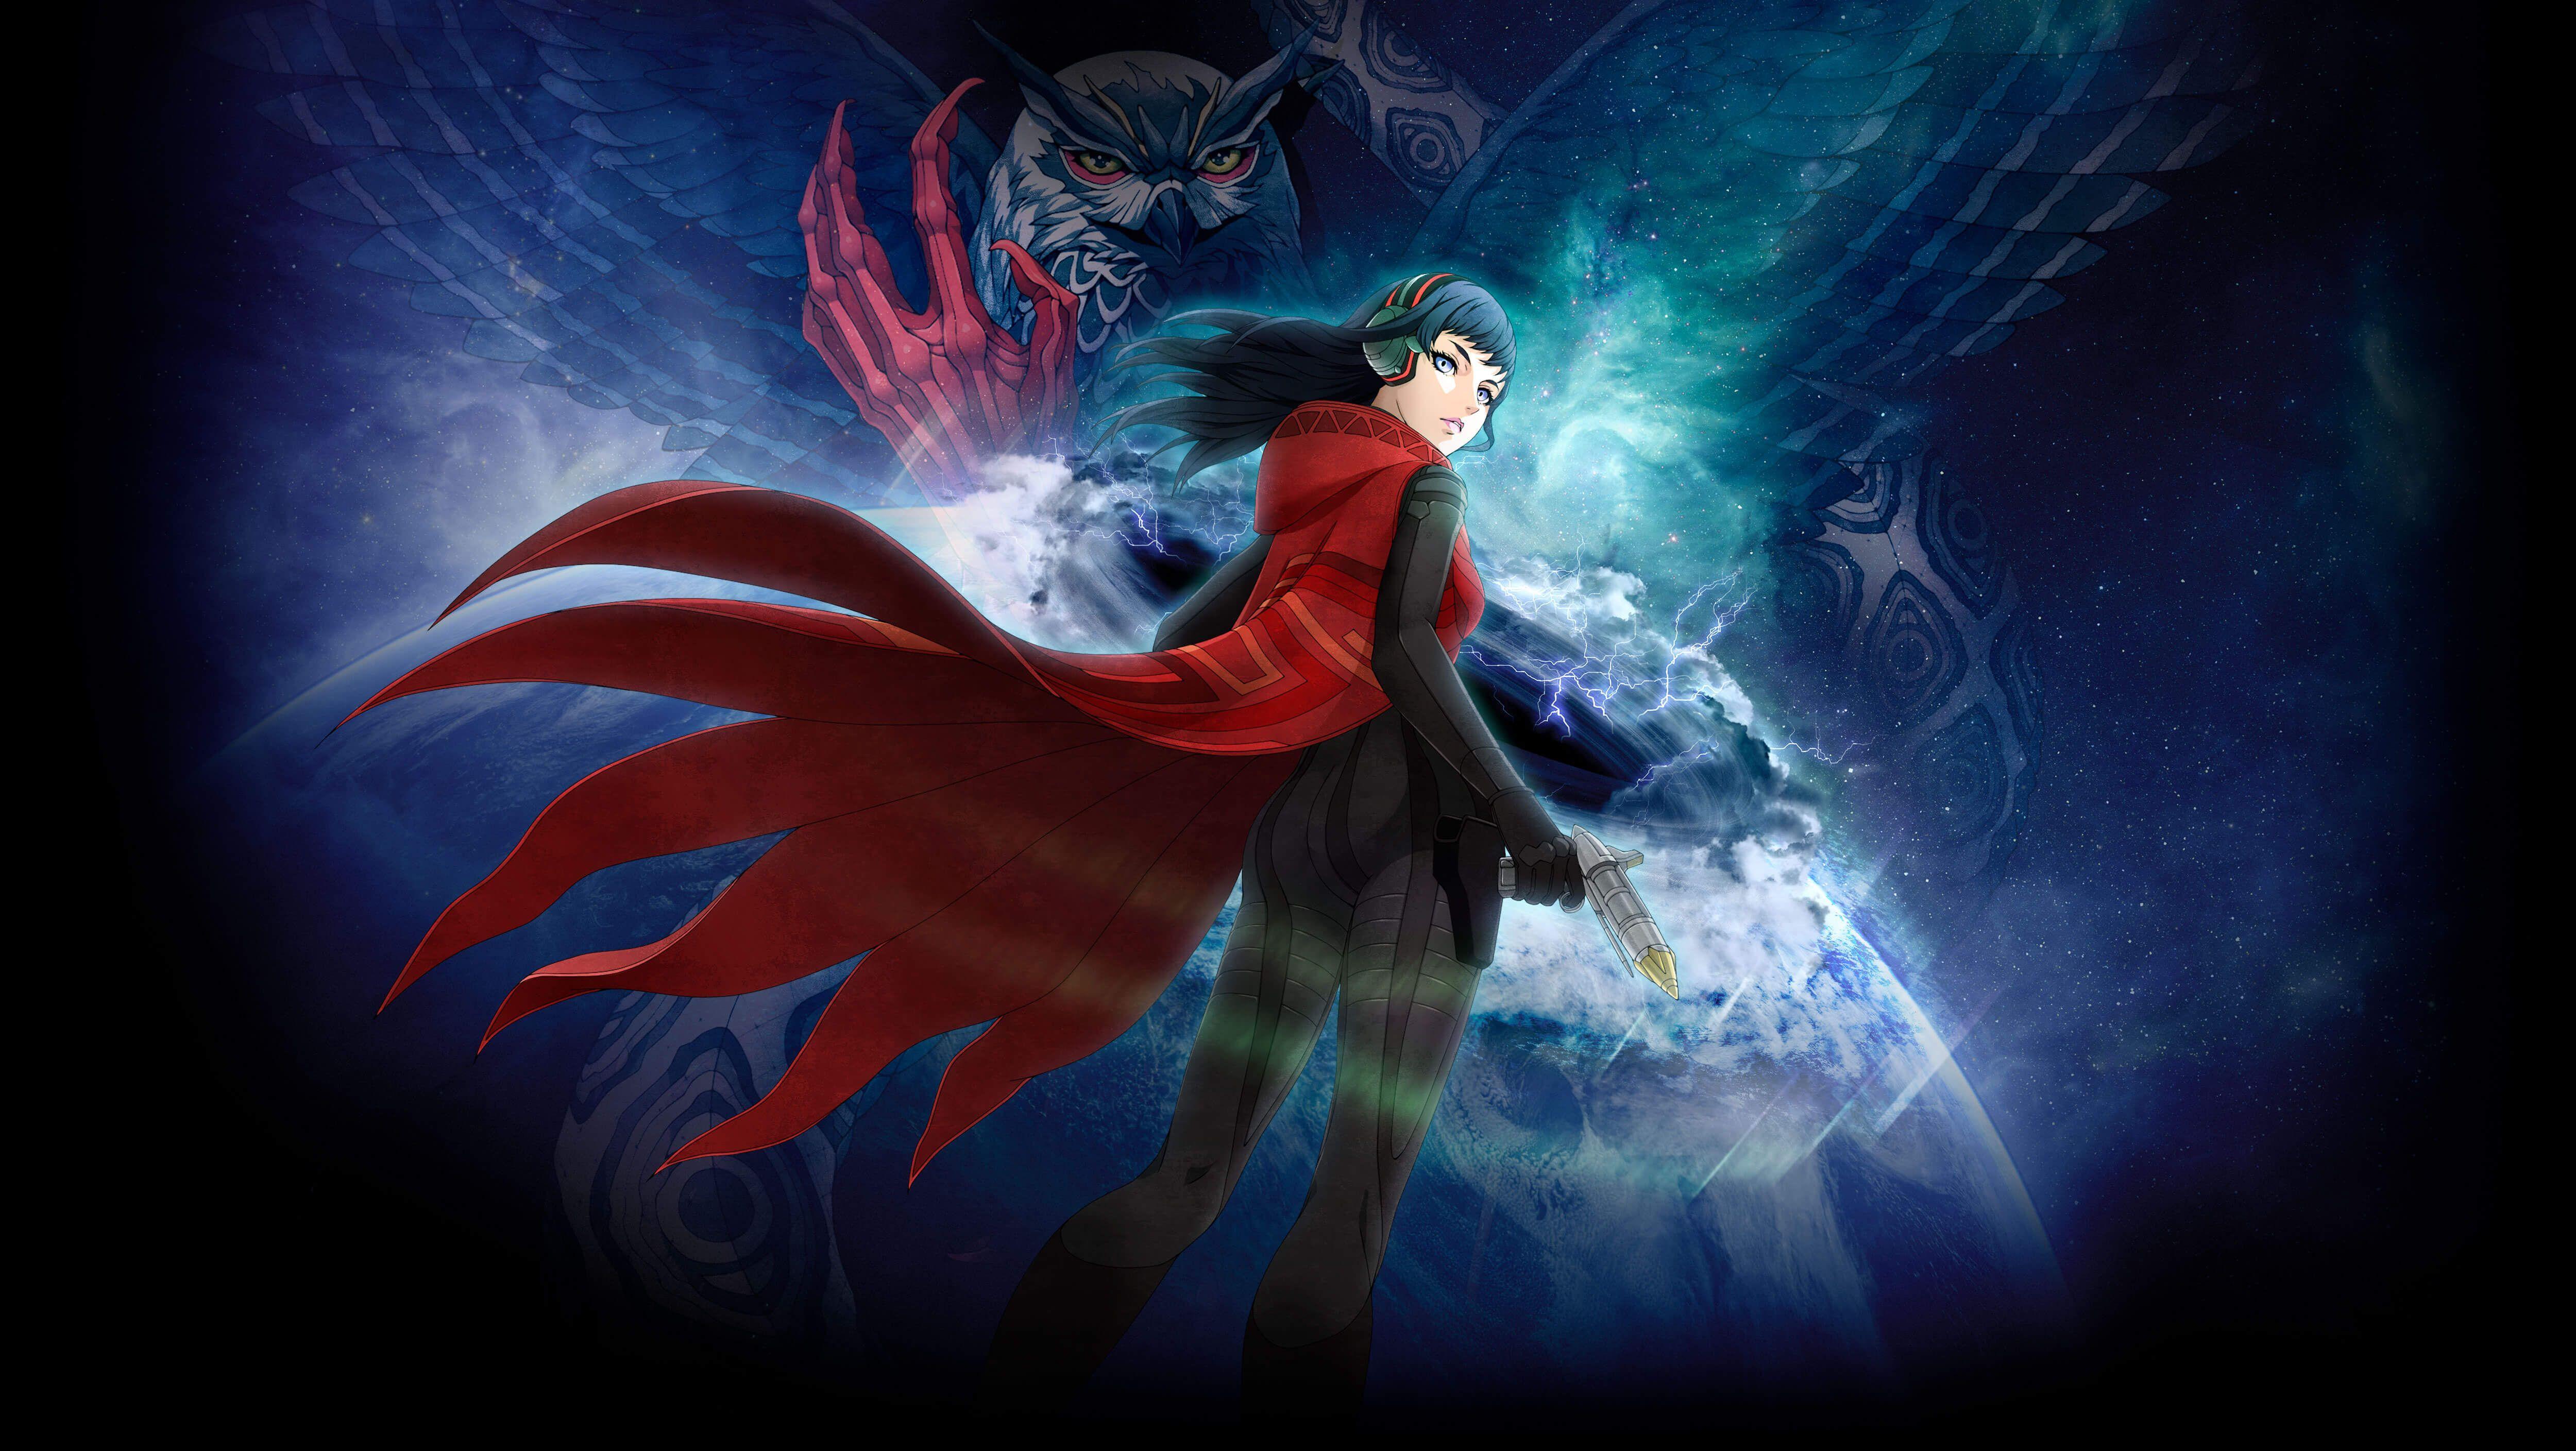 Shin Megami Tensei Strange Journey Redux Wallpapers Wallpaper Cave